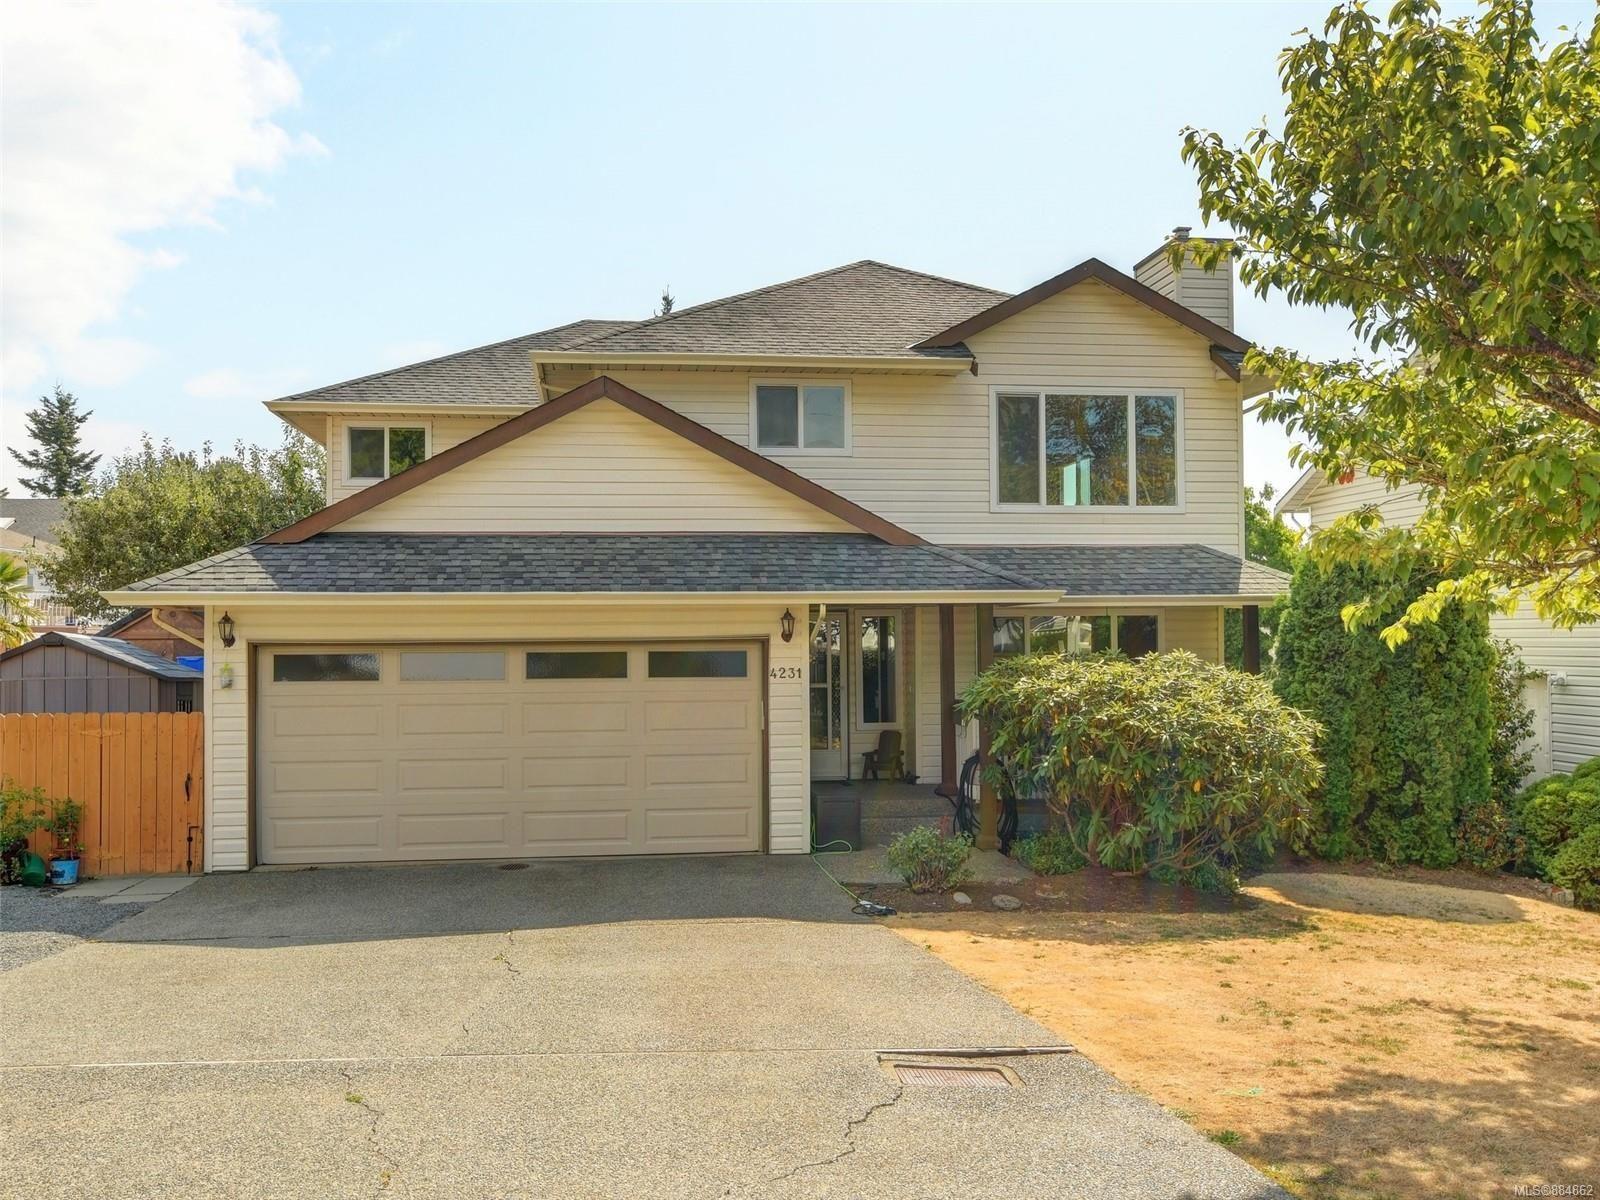 Main Photo: 4231 Ponderosa Cres in : SW Northridge House for sale (Saanich West)  : MLS®# 884862